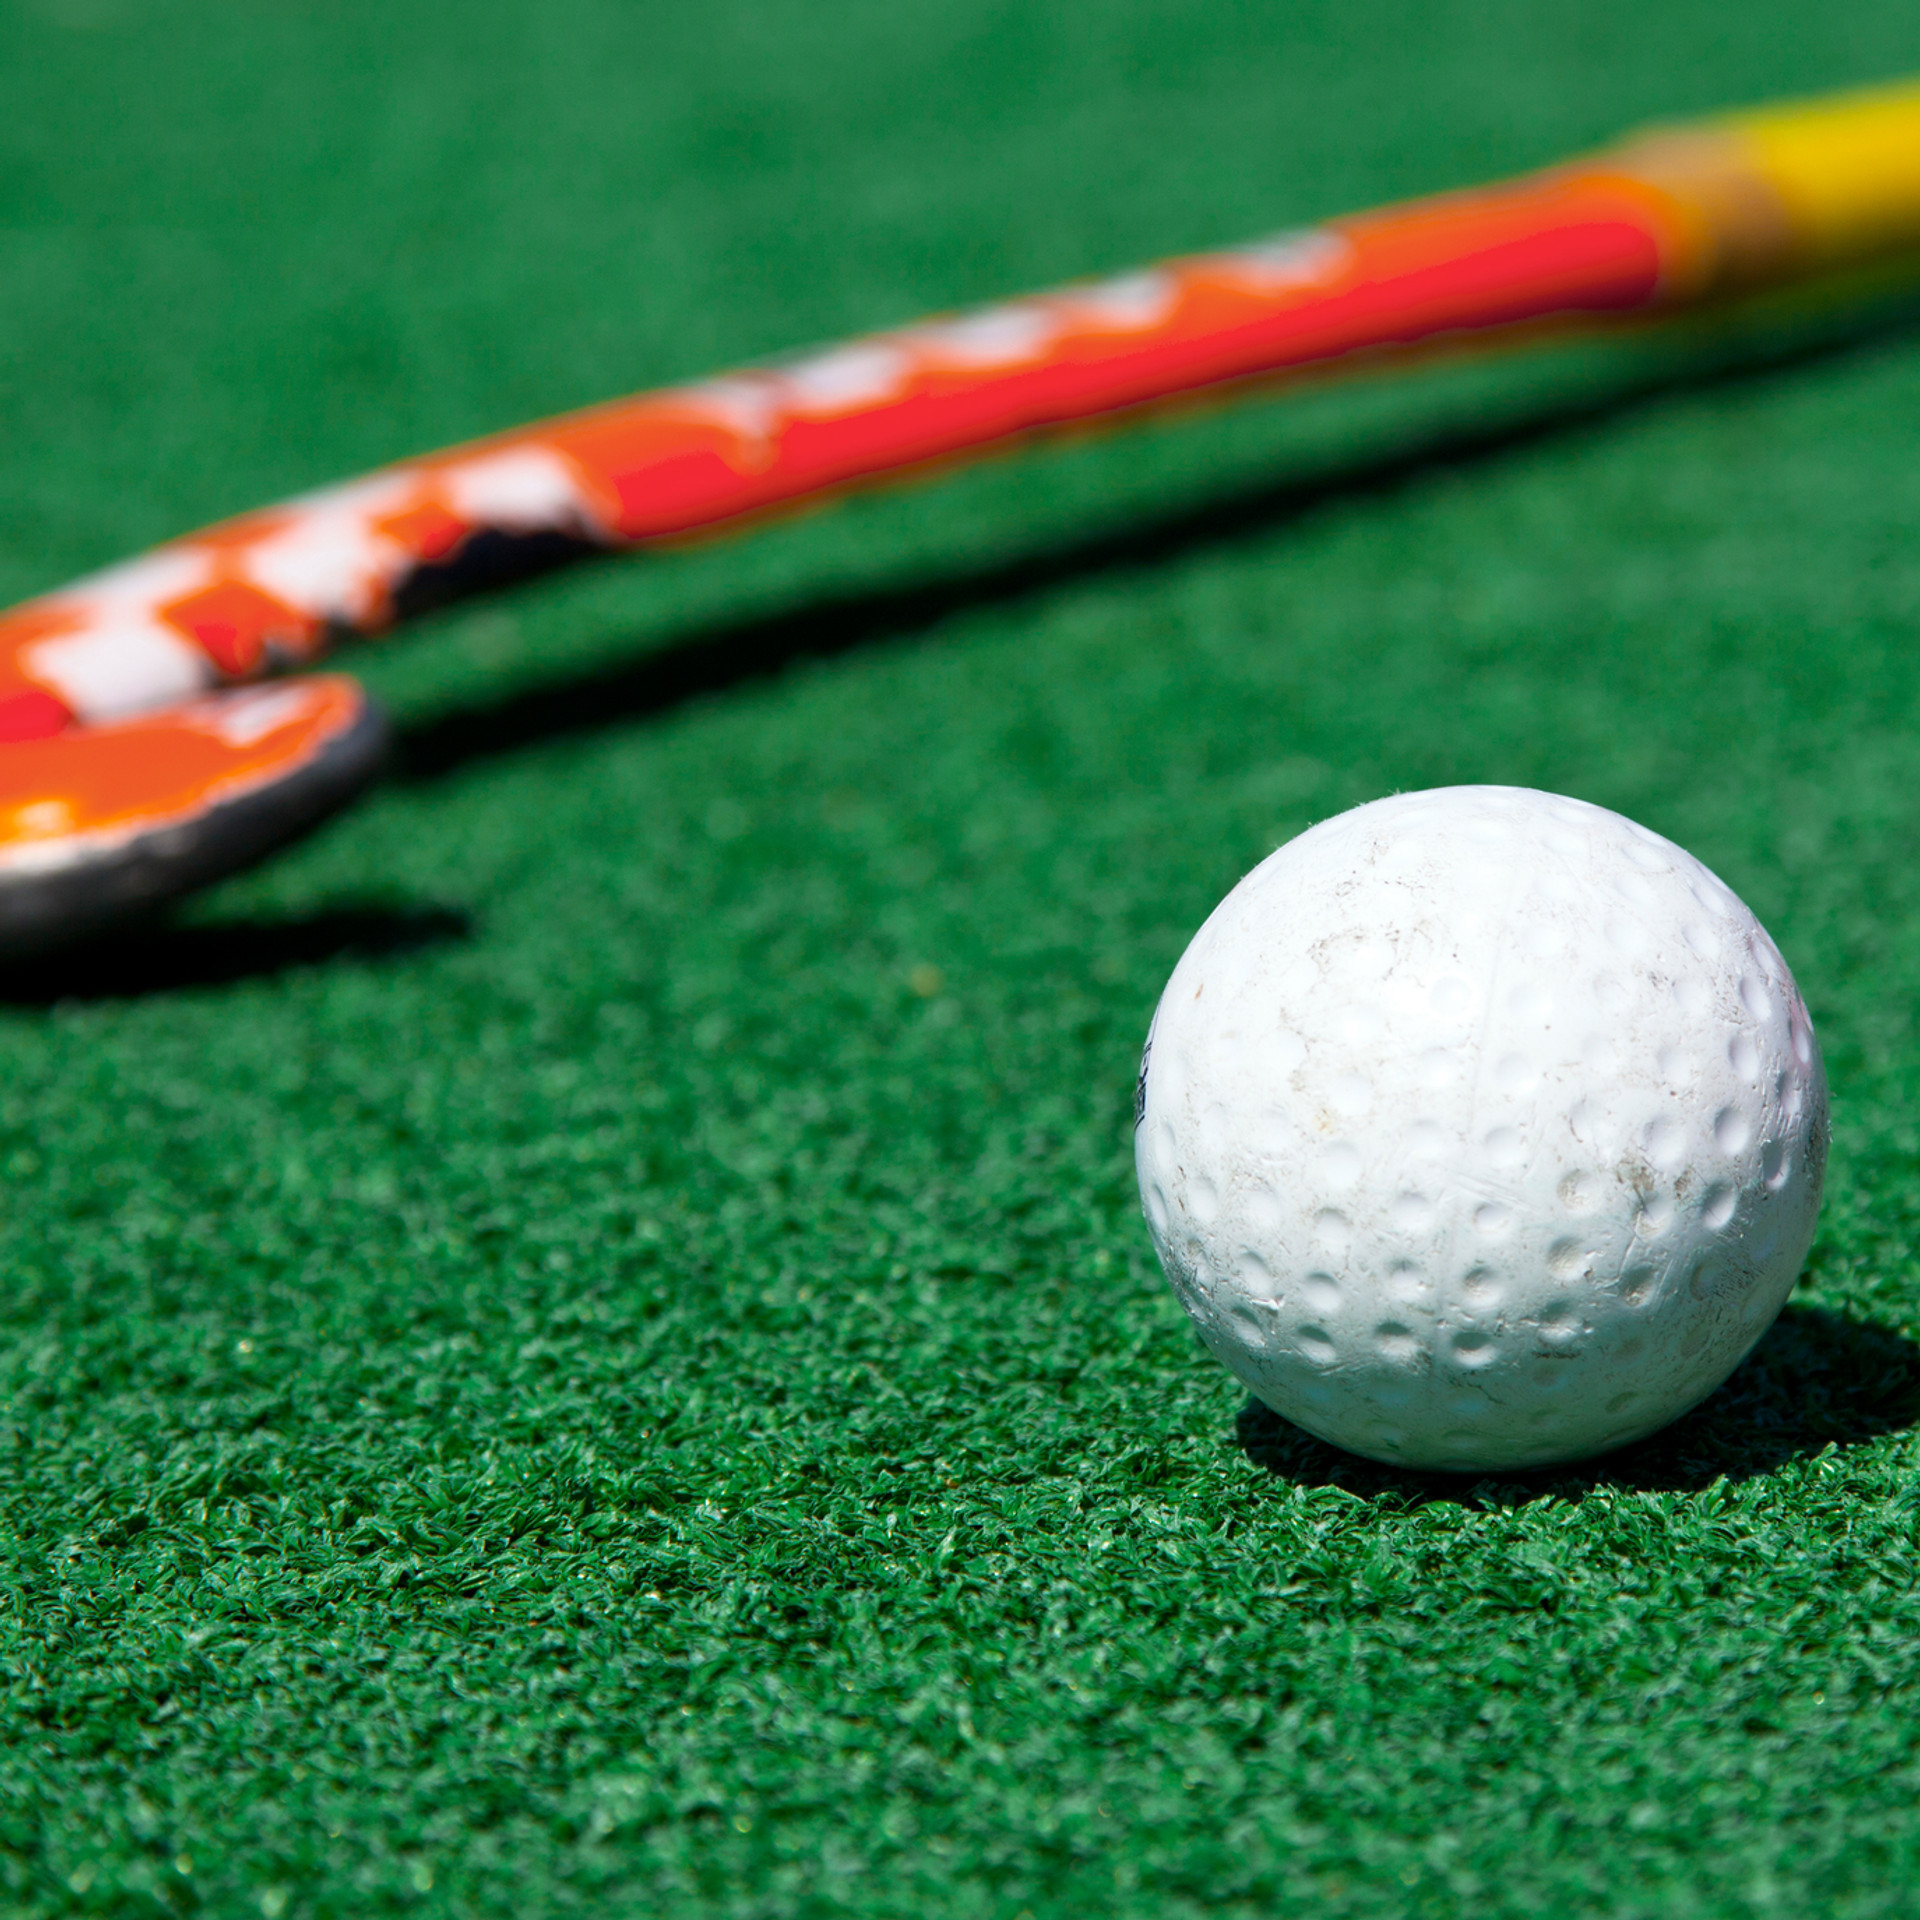 Field Hockey Stick